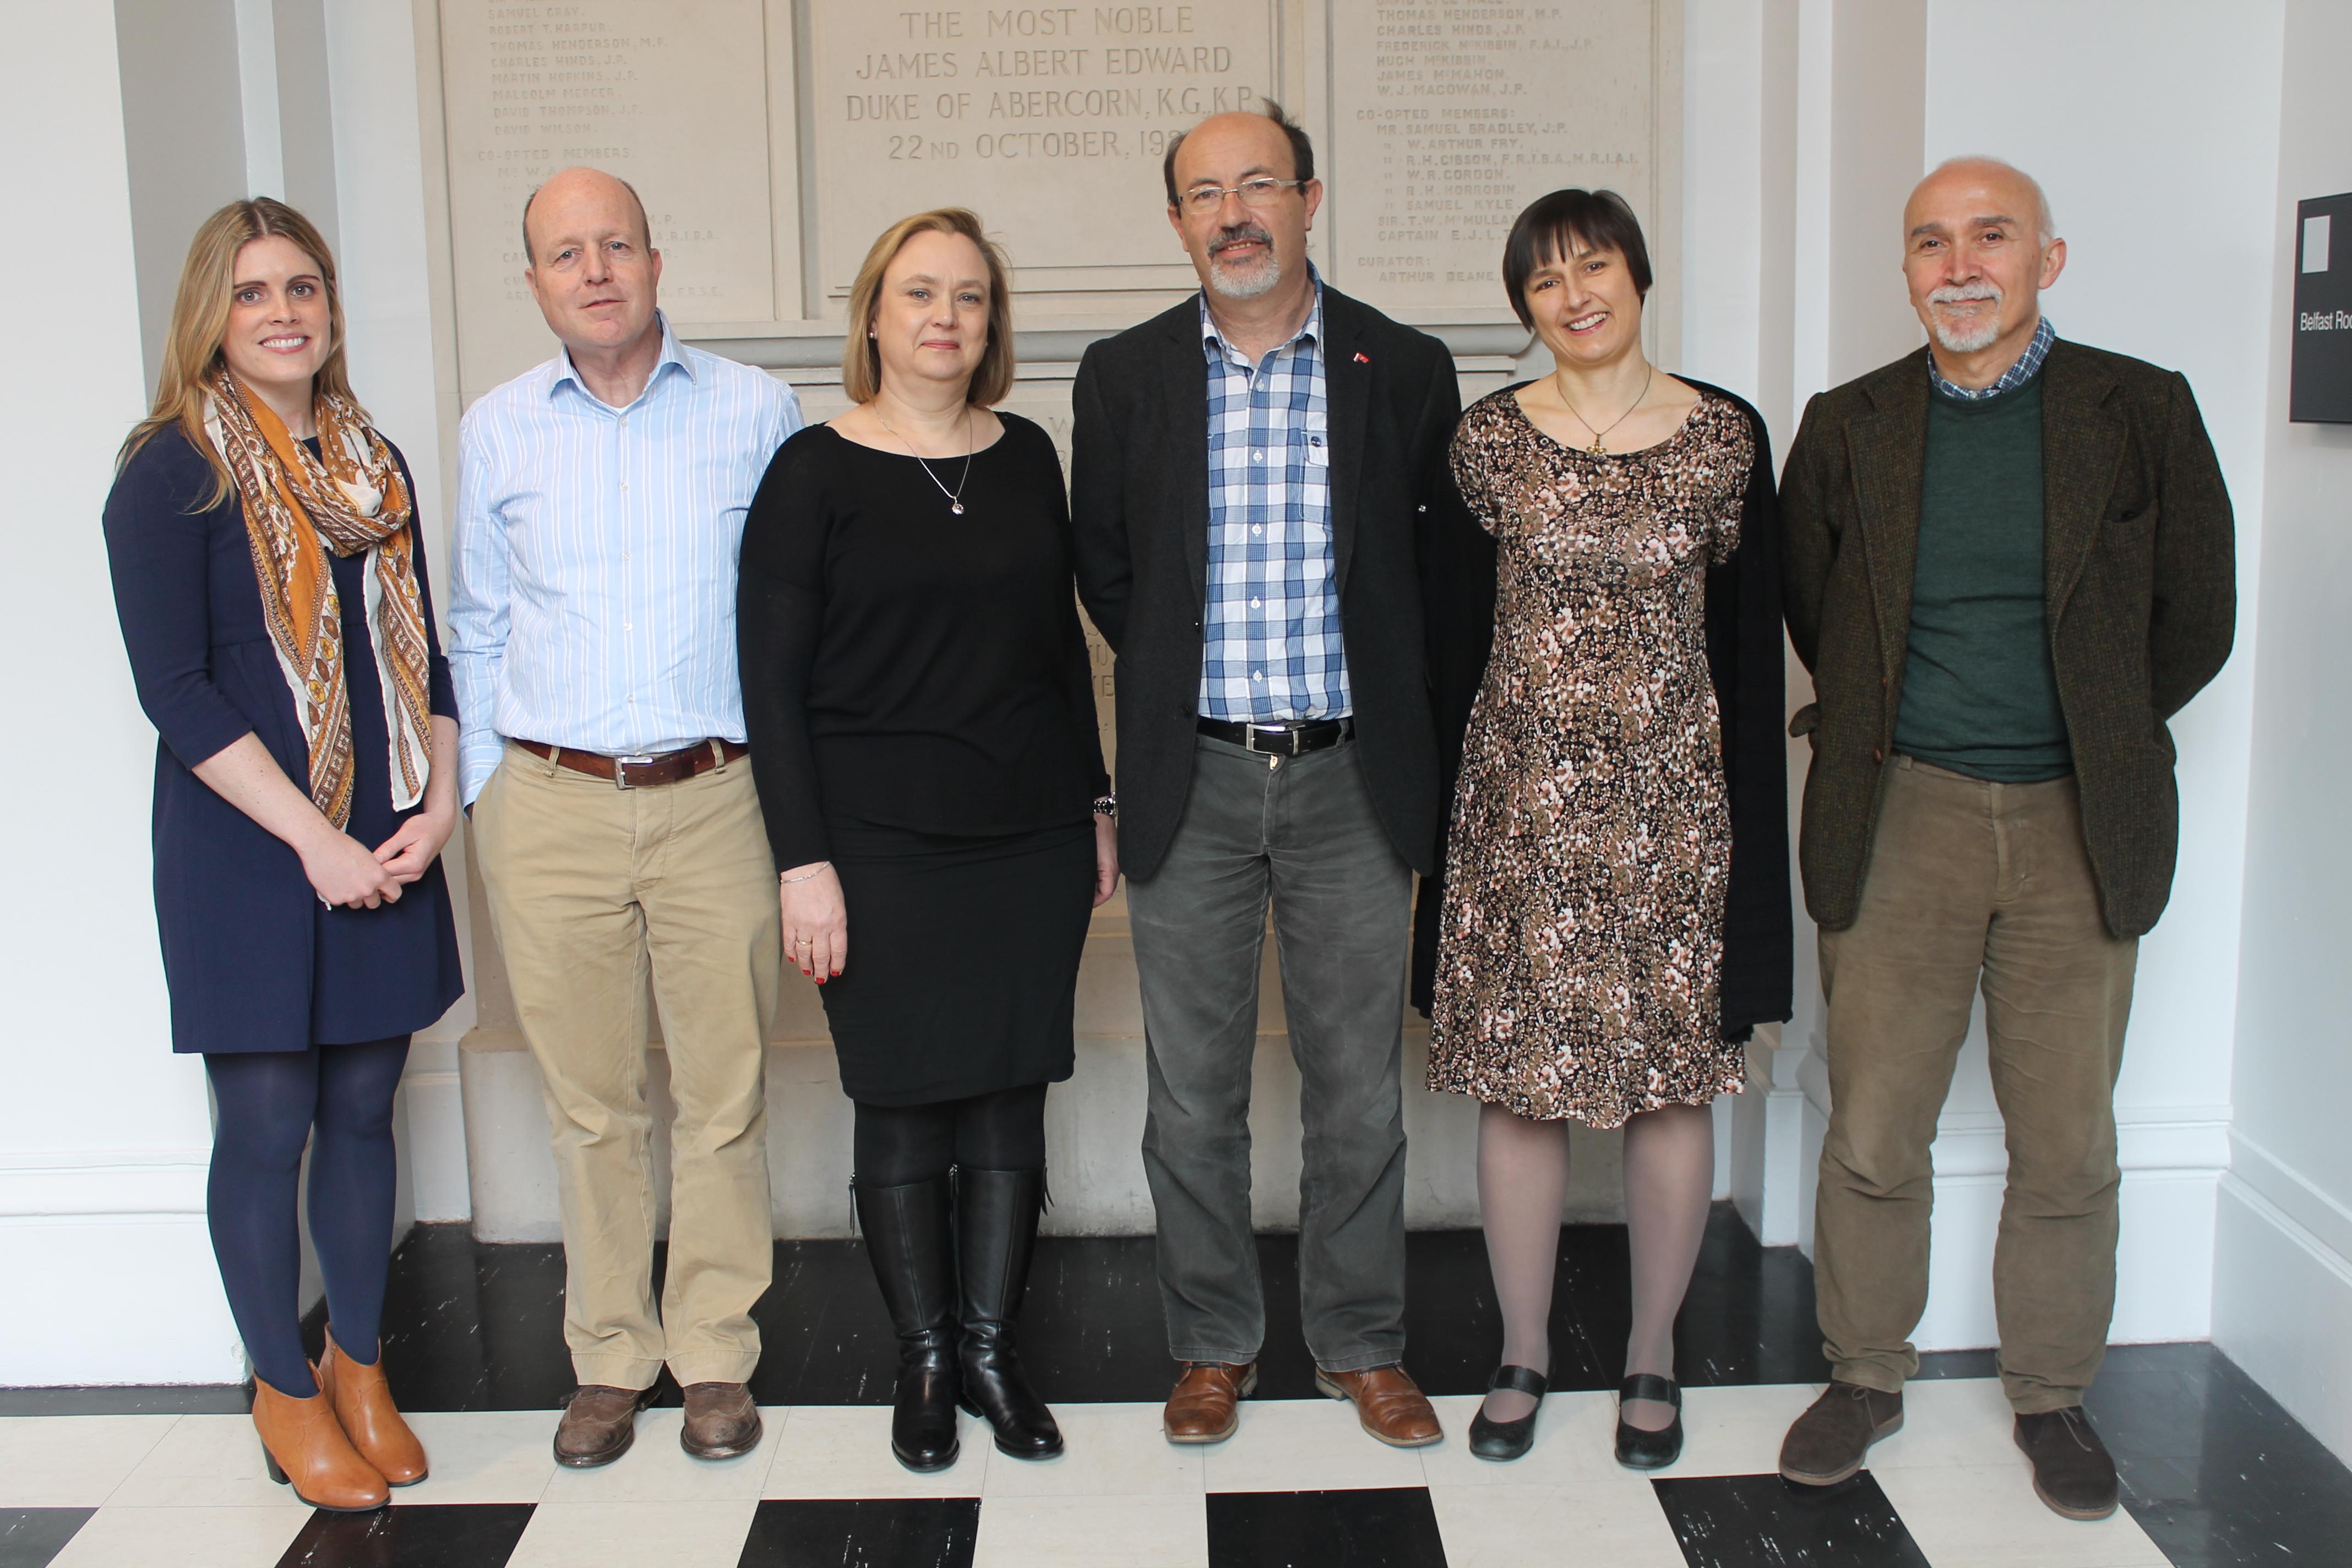 The new EUROCLIO Board (from right to left: Sinead Fitzsimons, Frank van den Akker, Lóa Steinunn Kristjánsdóttir, Mire Mladenovski, Riitta Mikkola, and Paolo Ceccoli).